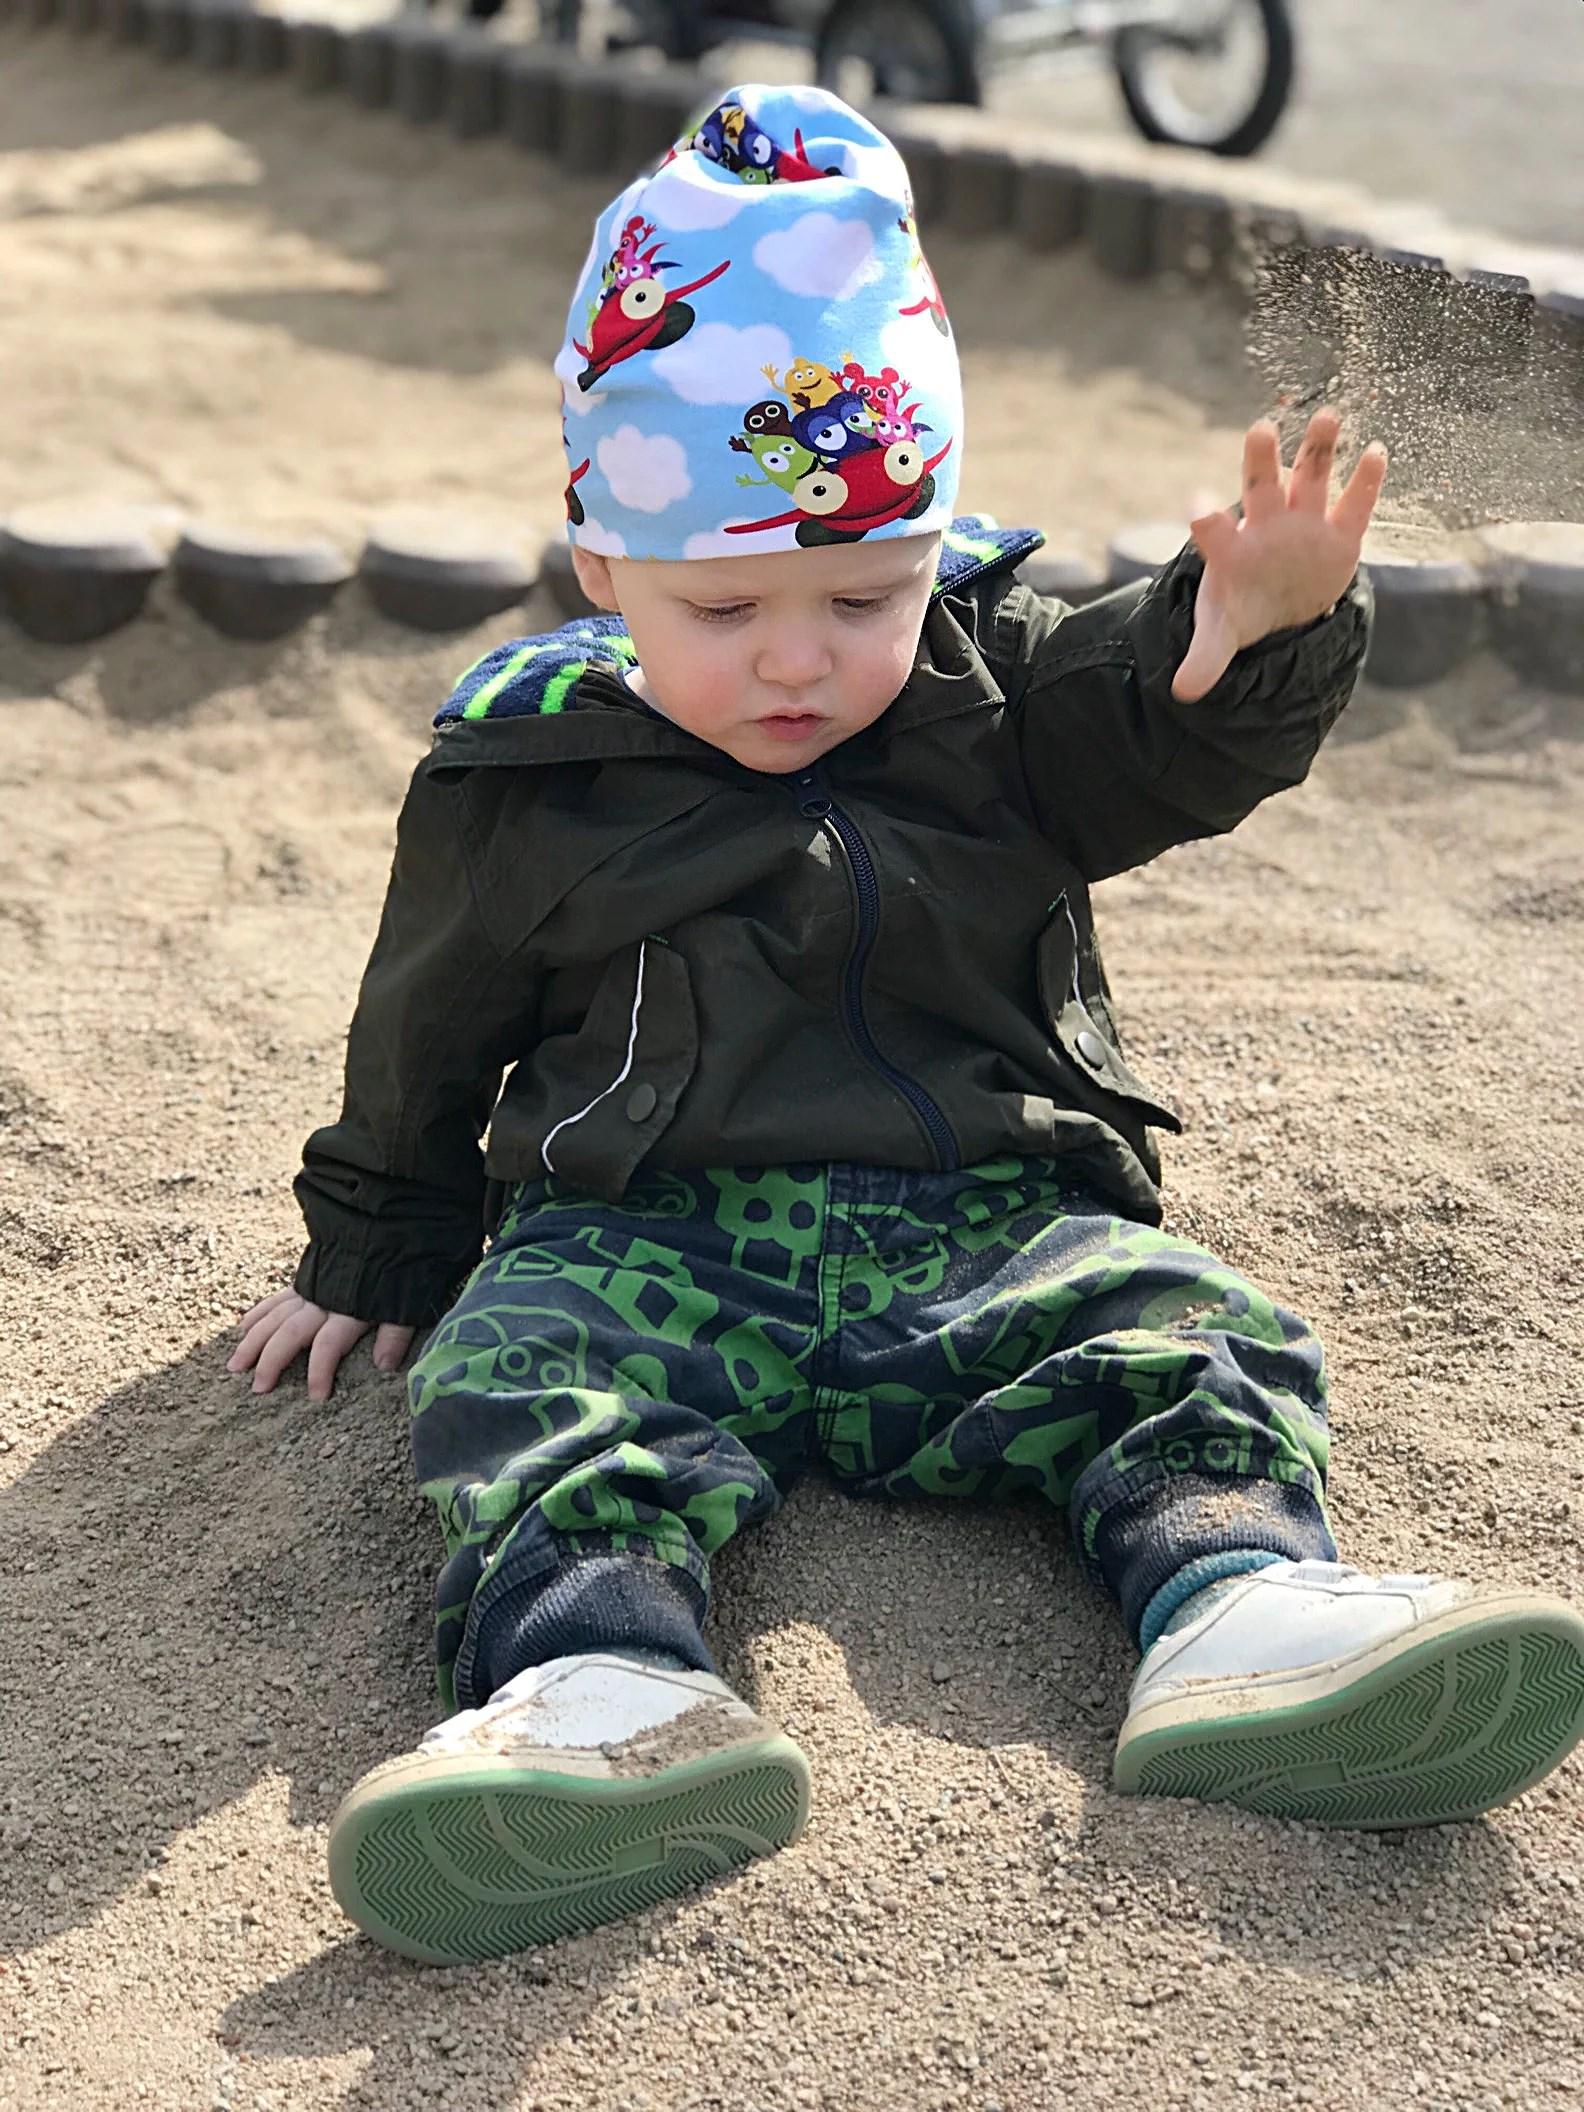 Video - Lek i Folkets Park!